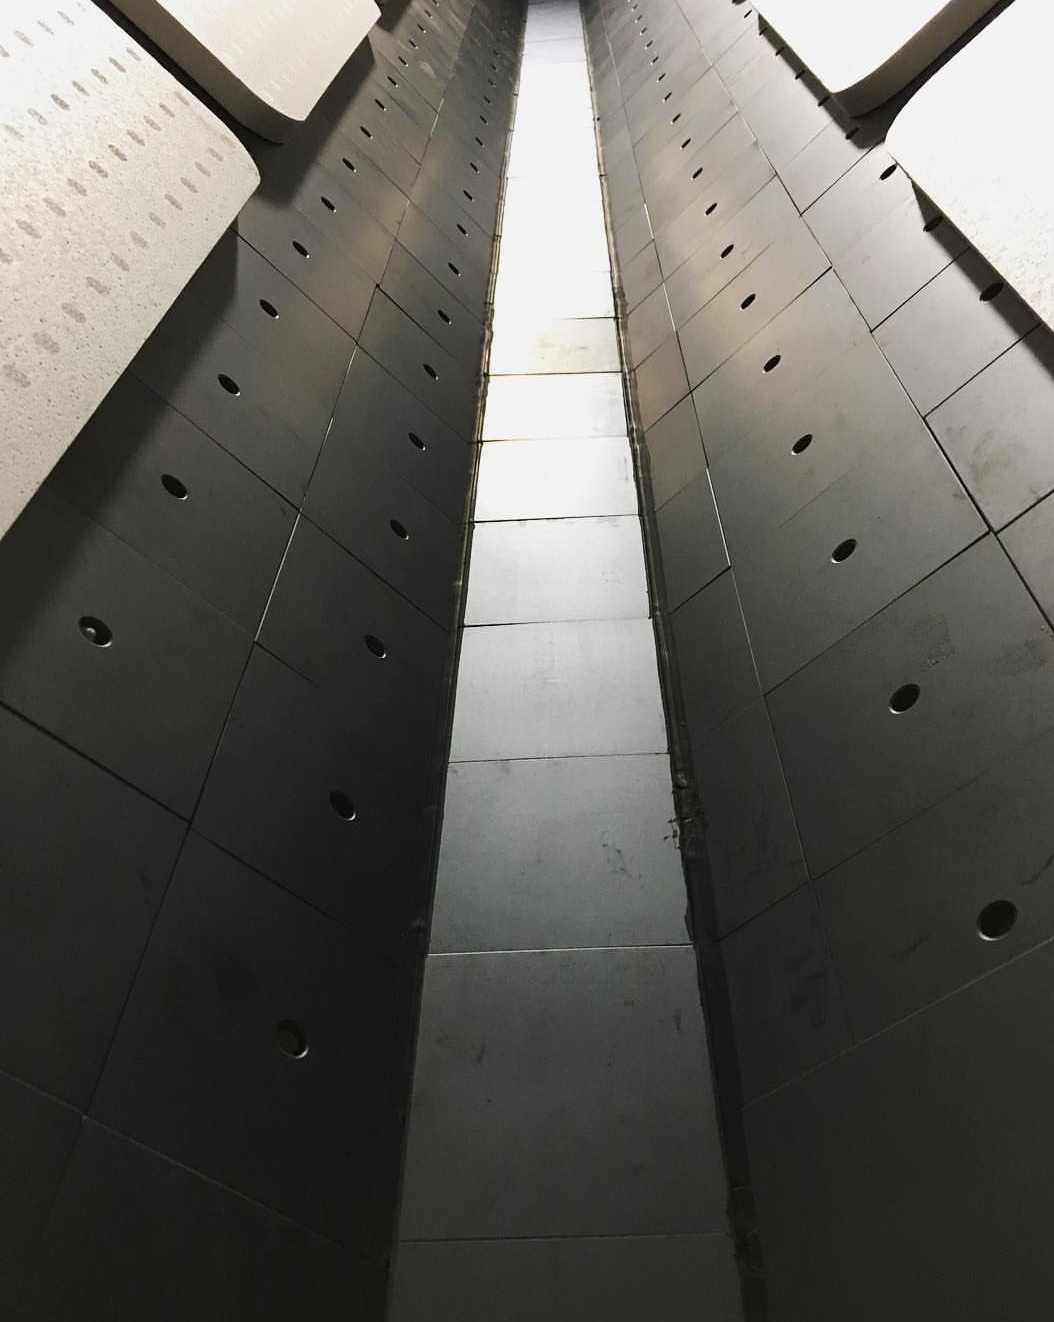 EMC Ferrite tiles